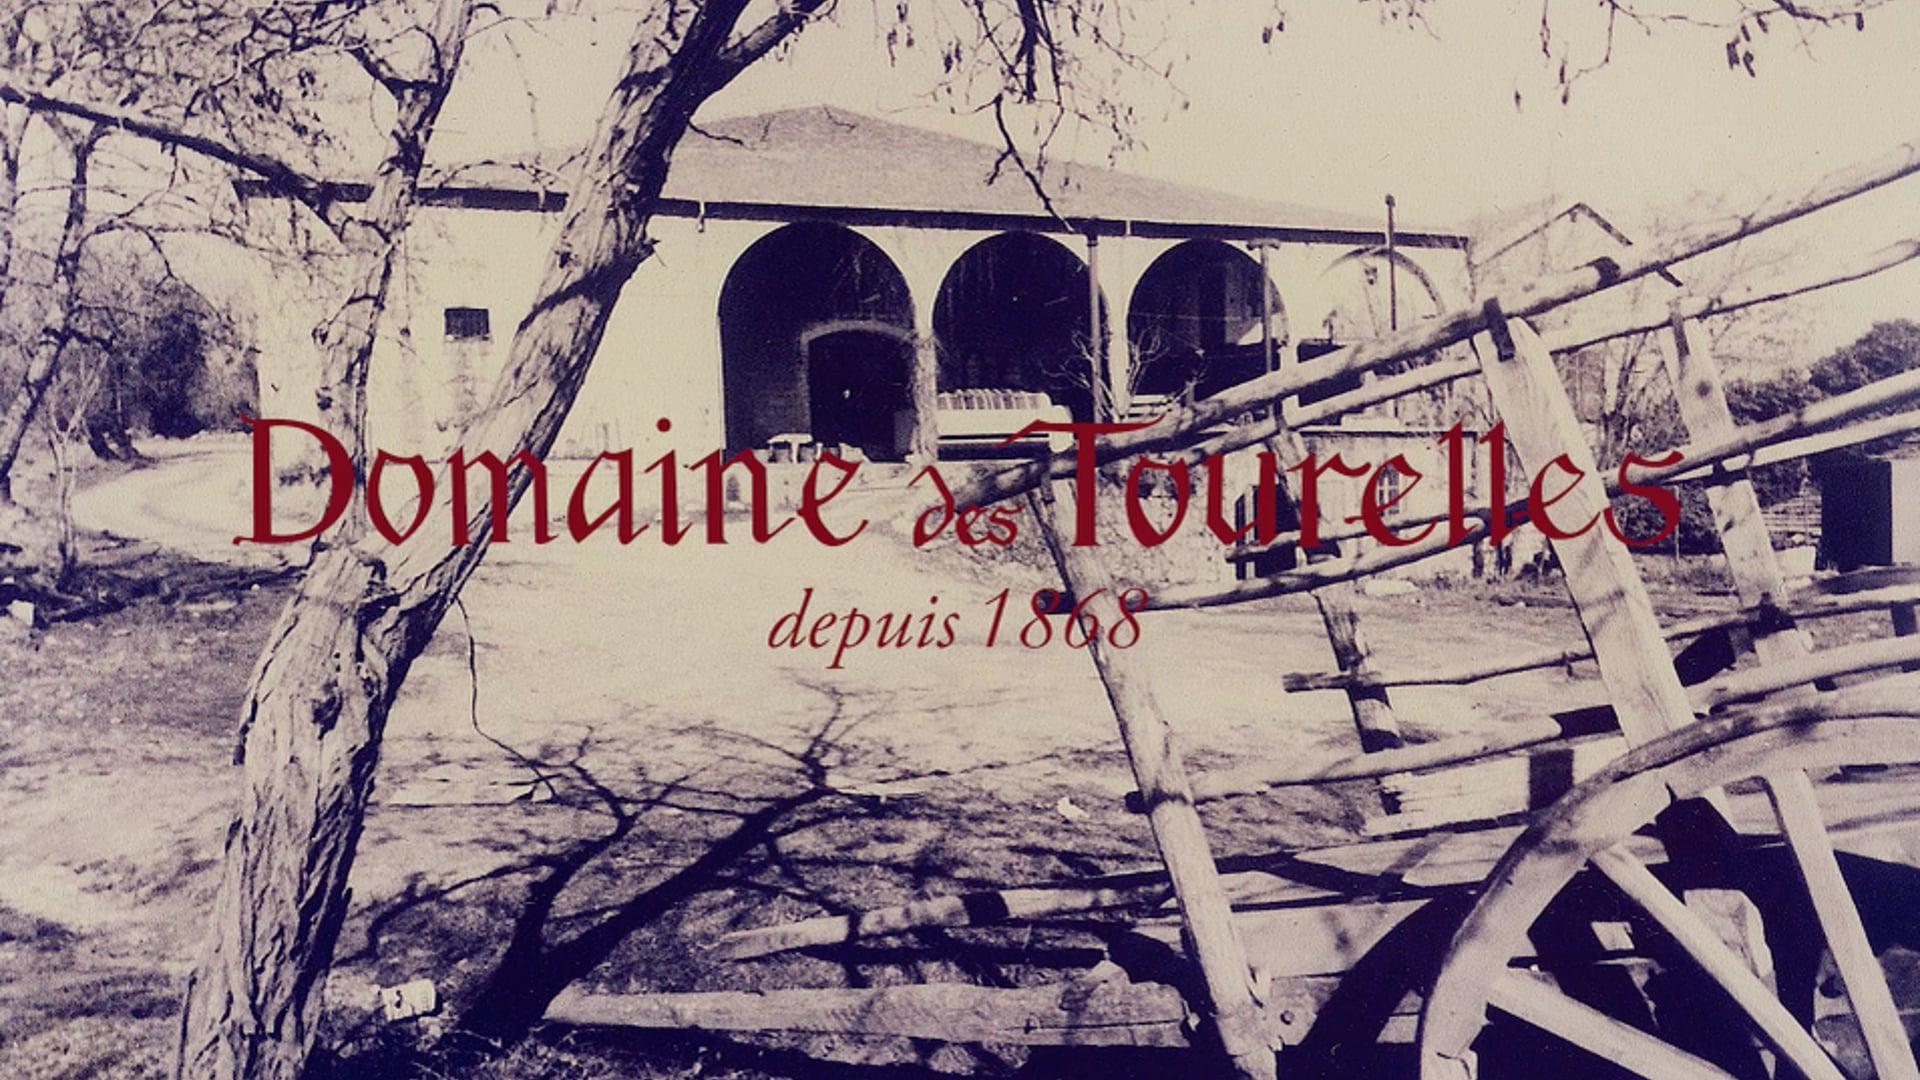 Co-DIRECTOR & EDITOR | DOMAINE DES TOURELLES | FILM 2018